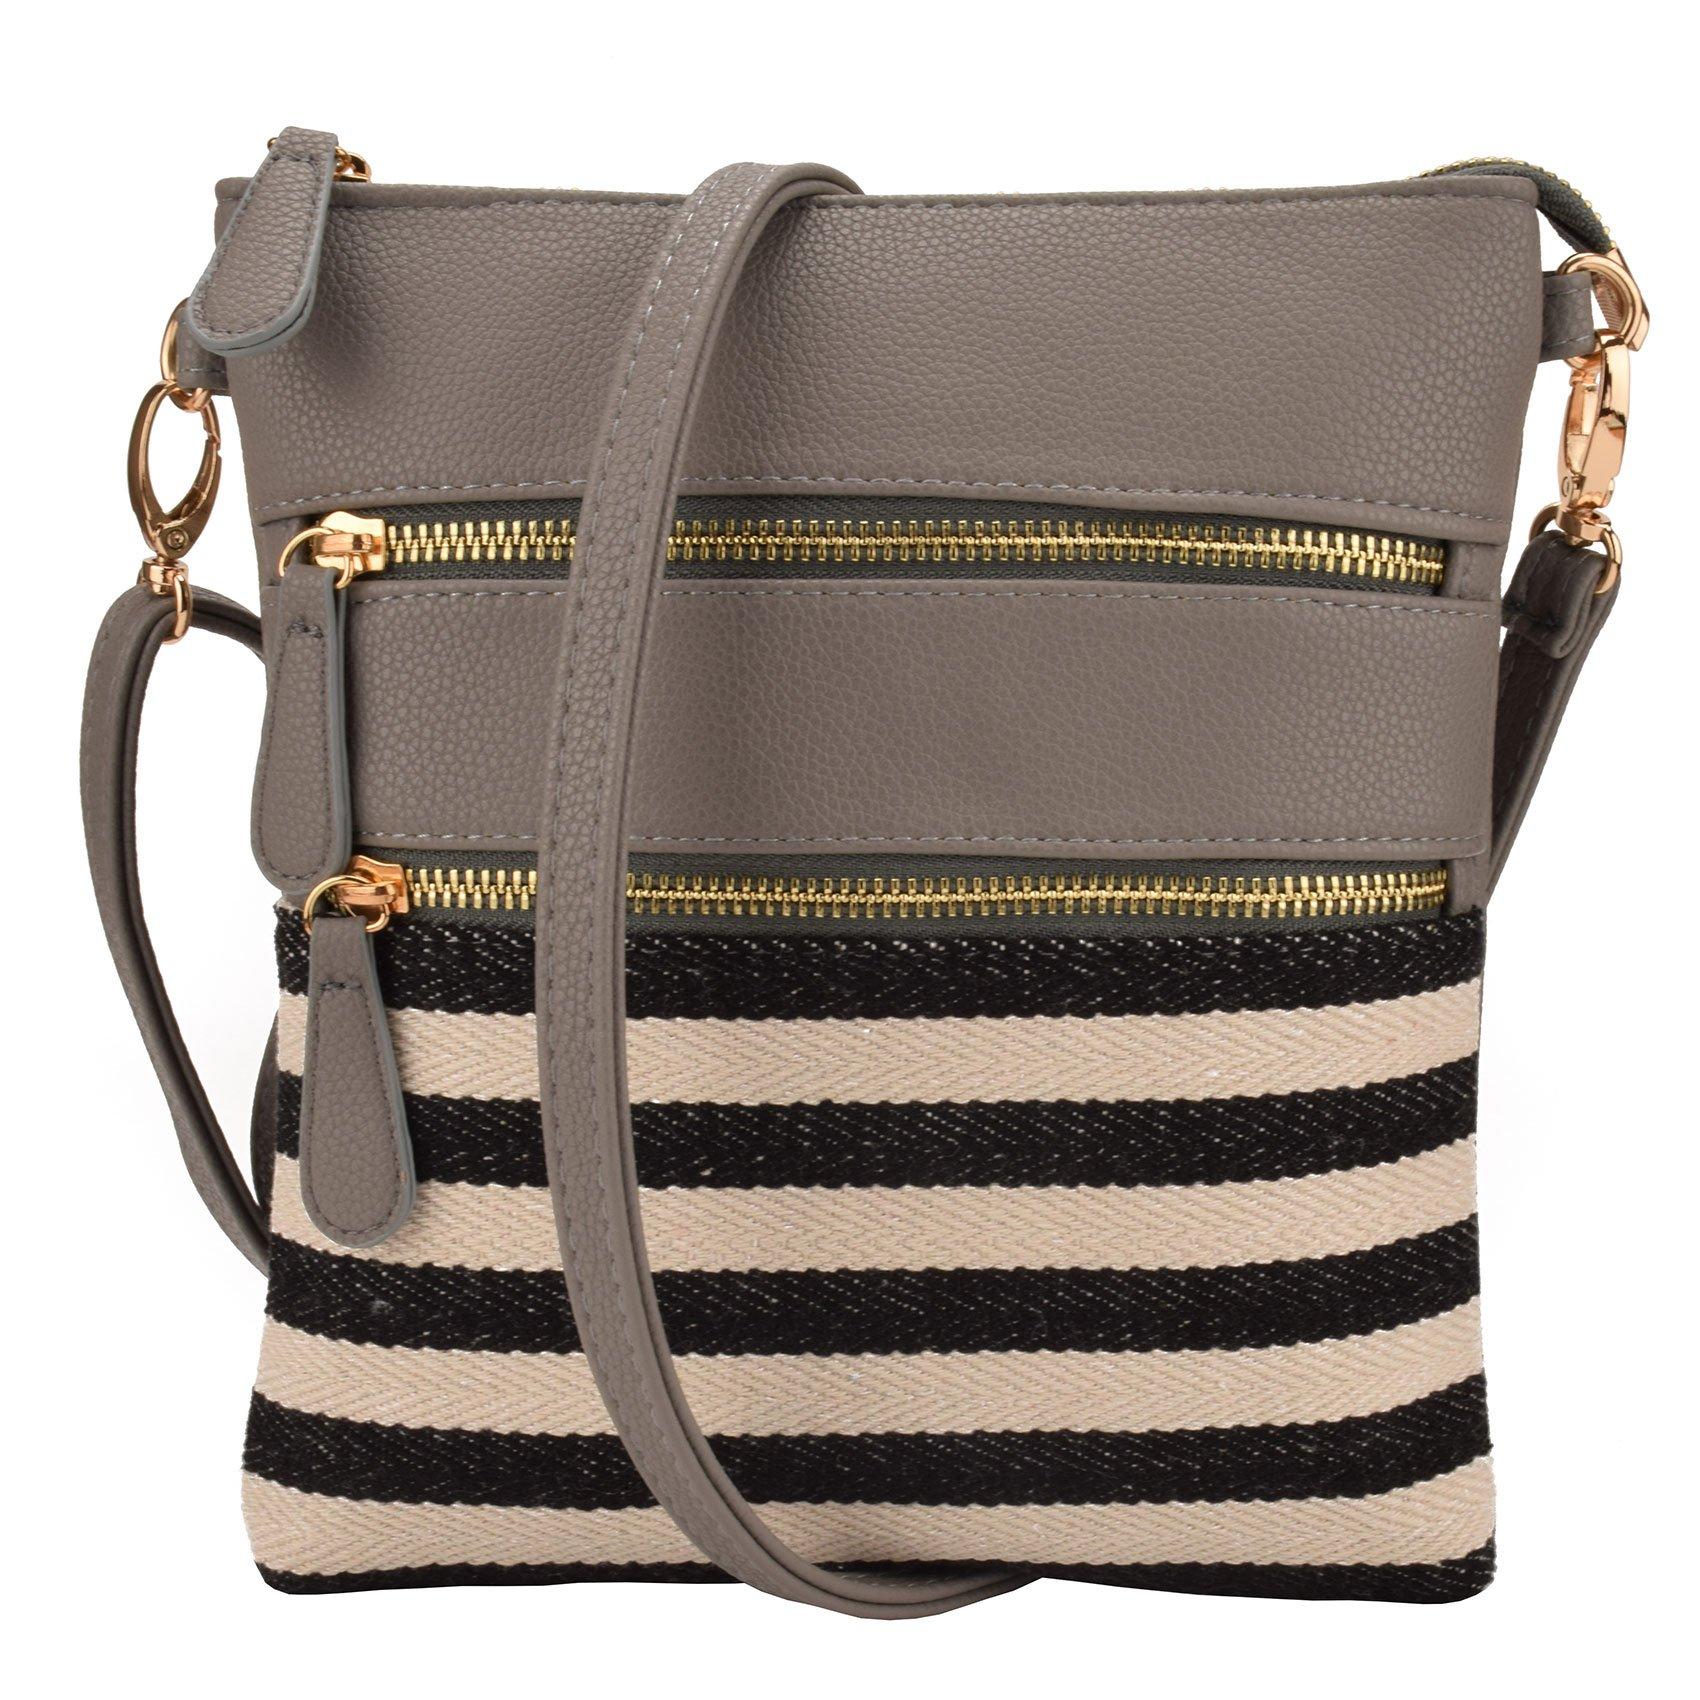 JIARUO Small Stripe Canvas patchwork leahter Women Crossbody bag handbag shoulder bag (Grey)